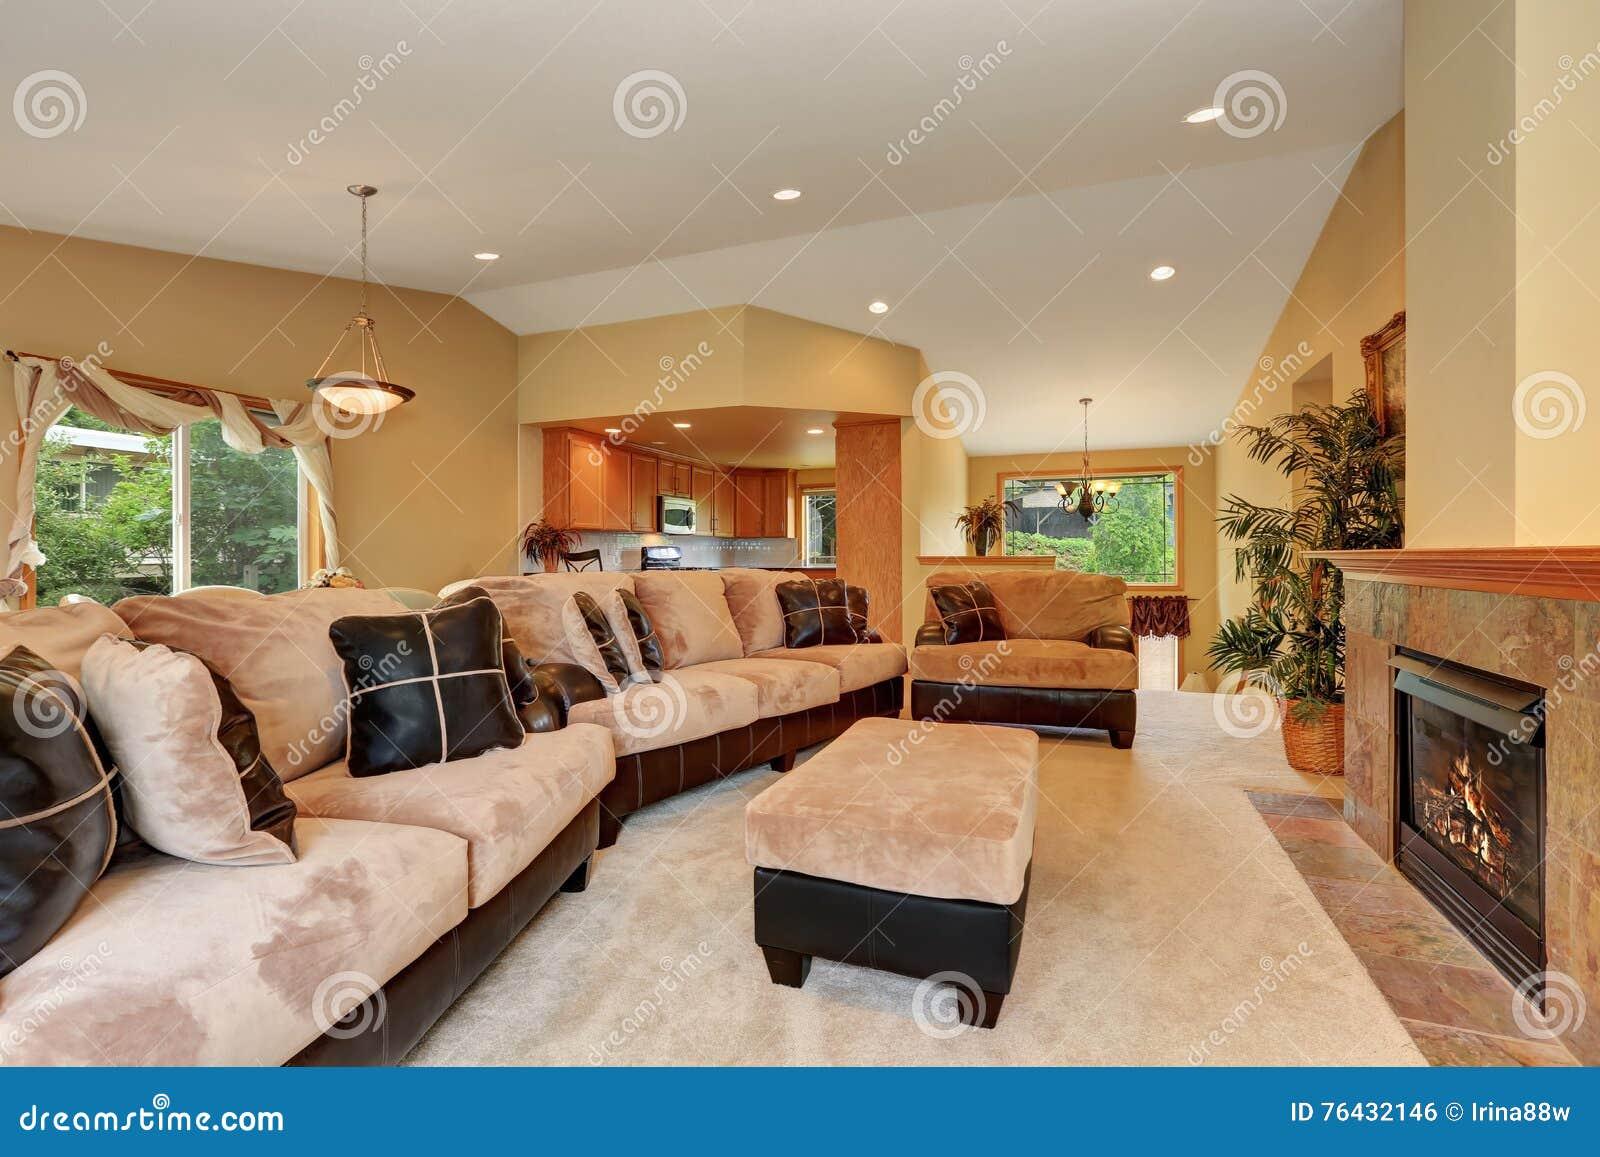 Fabulous Gorgeous Living Room Interior With Beige Velvet And Leather Spiritservingveterans Wood Chair Design Ideas Spiritservingveteransorg